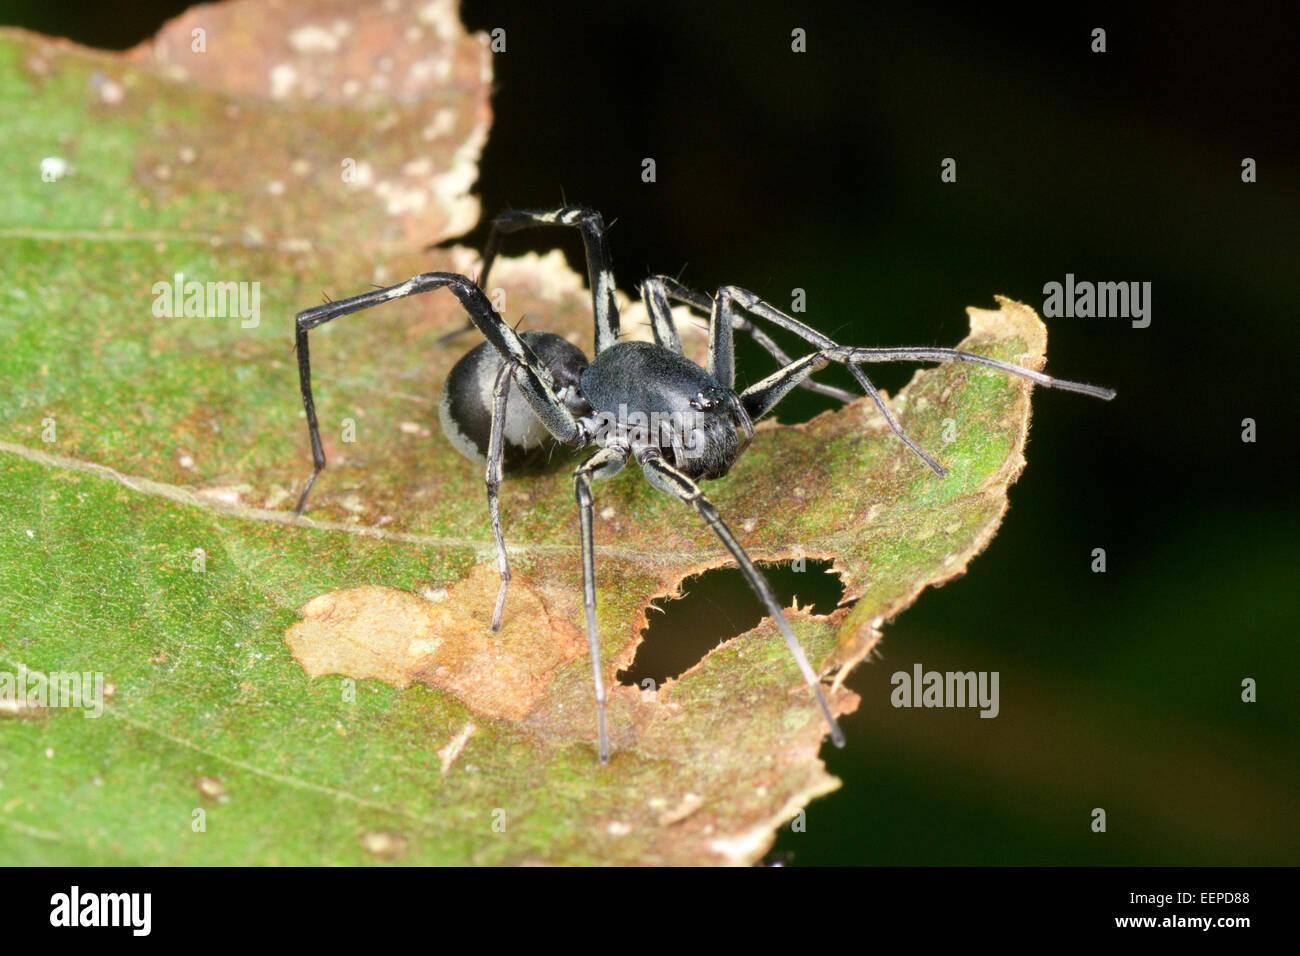 Ameise mimische Corinnid Sac Spider (Familie Corinnidae), Khao Yai Nationalpark, Thailand Stockbild